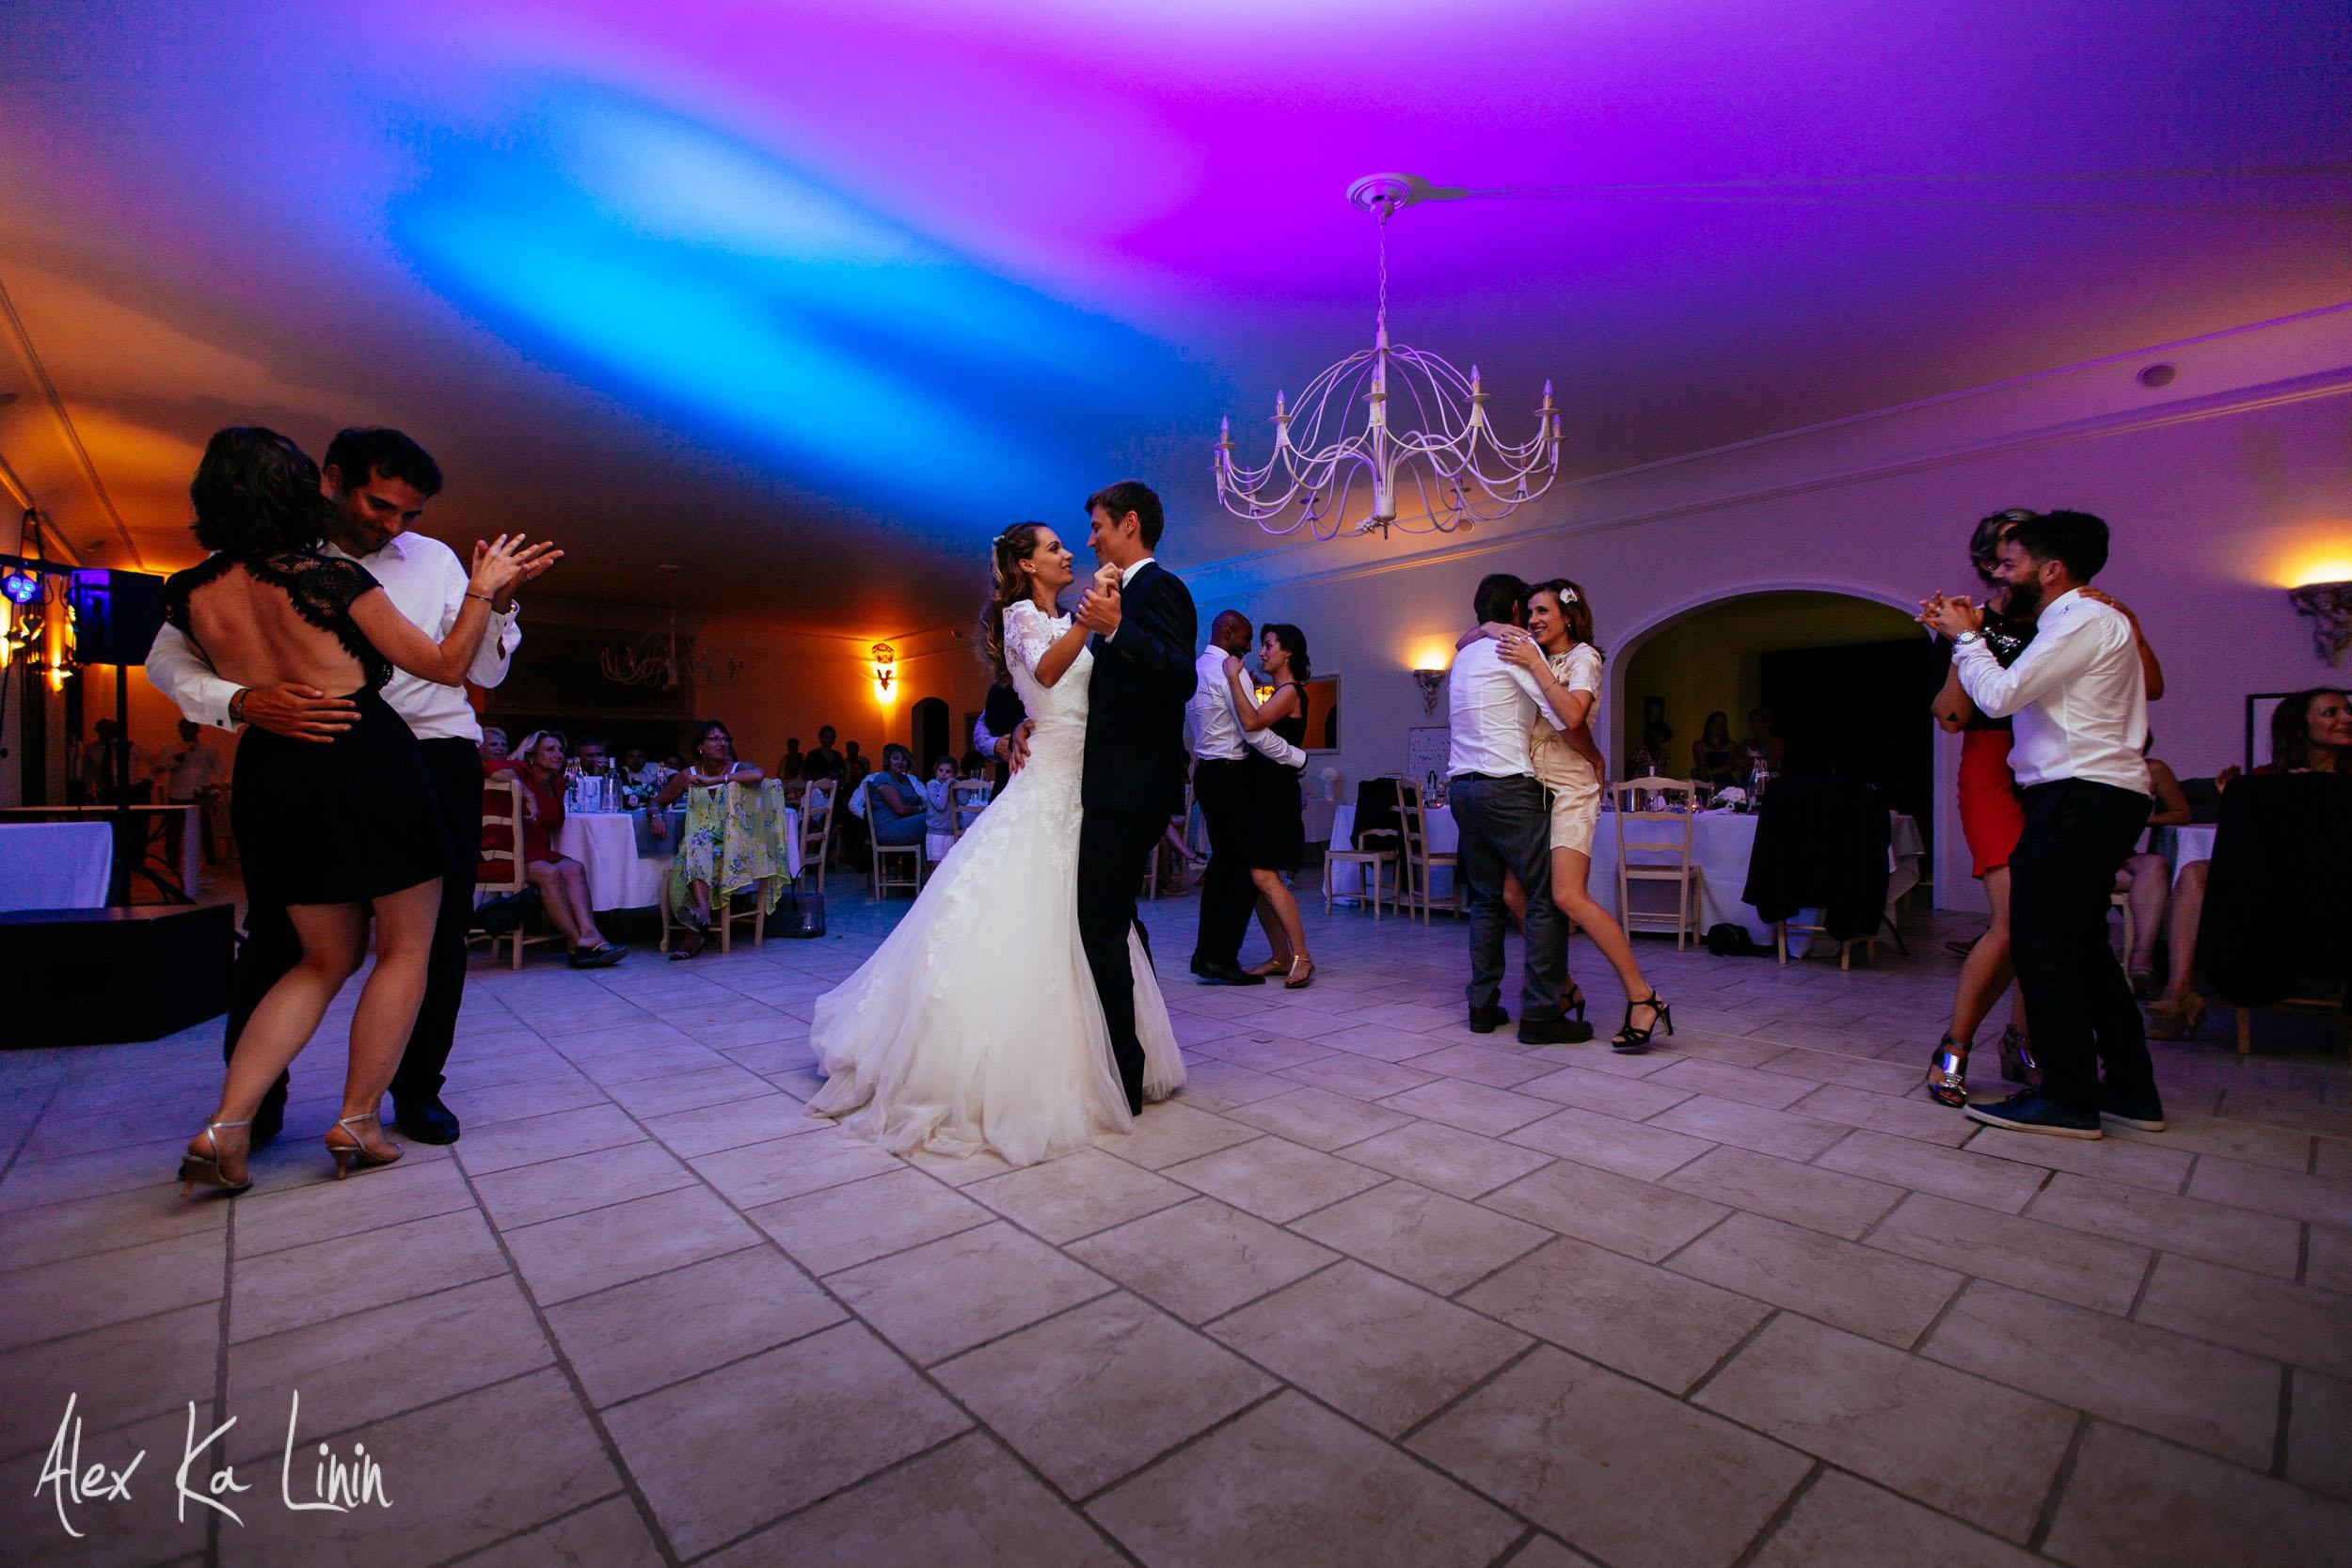 AlexKa_wedding_mariage_photographer-52.jpg